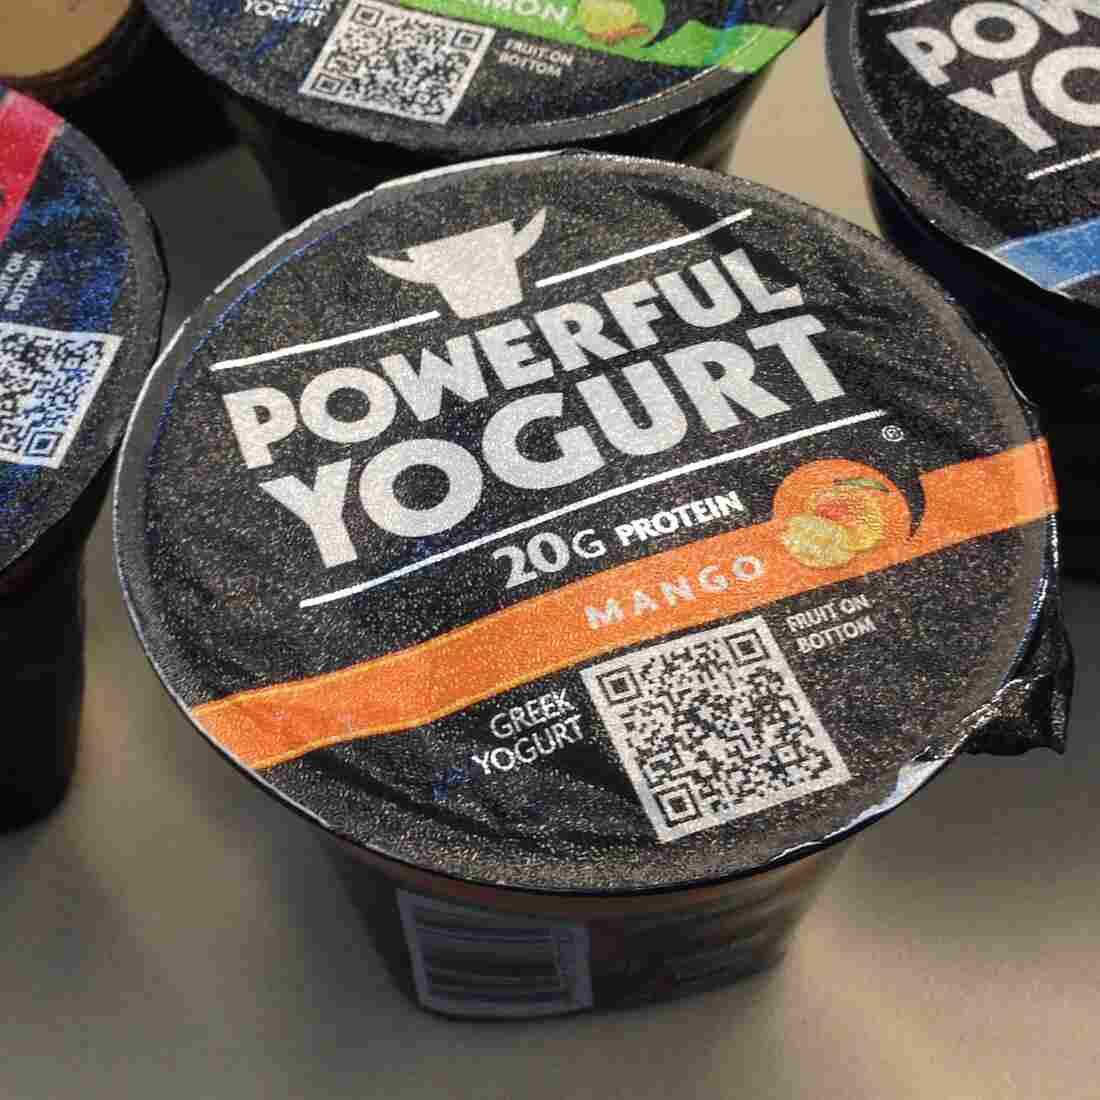 Yogurt For Men: A Review